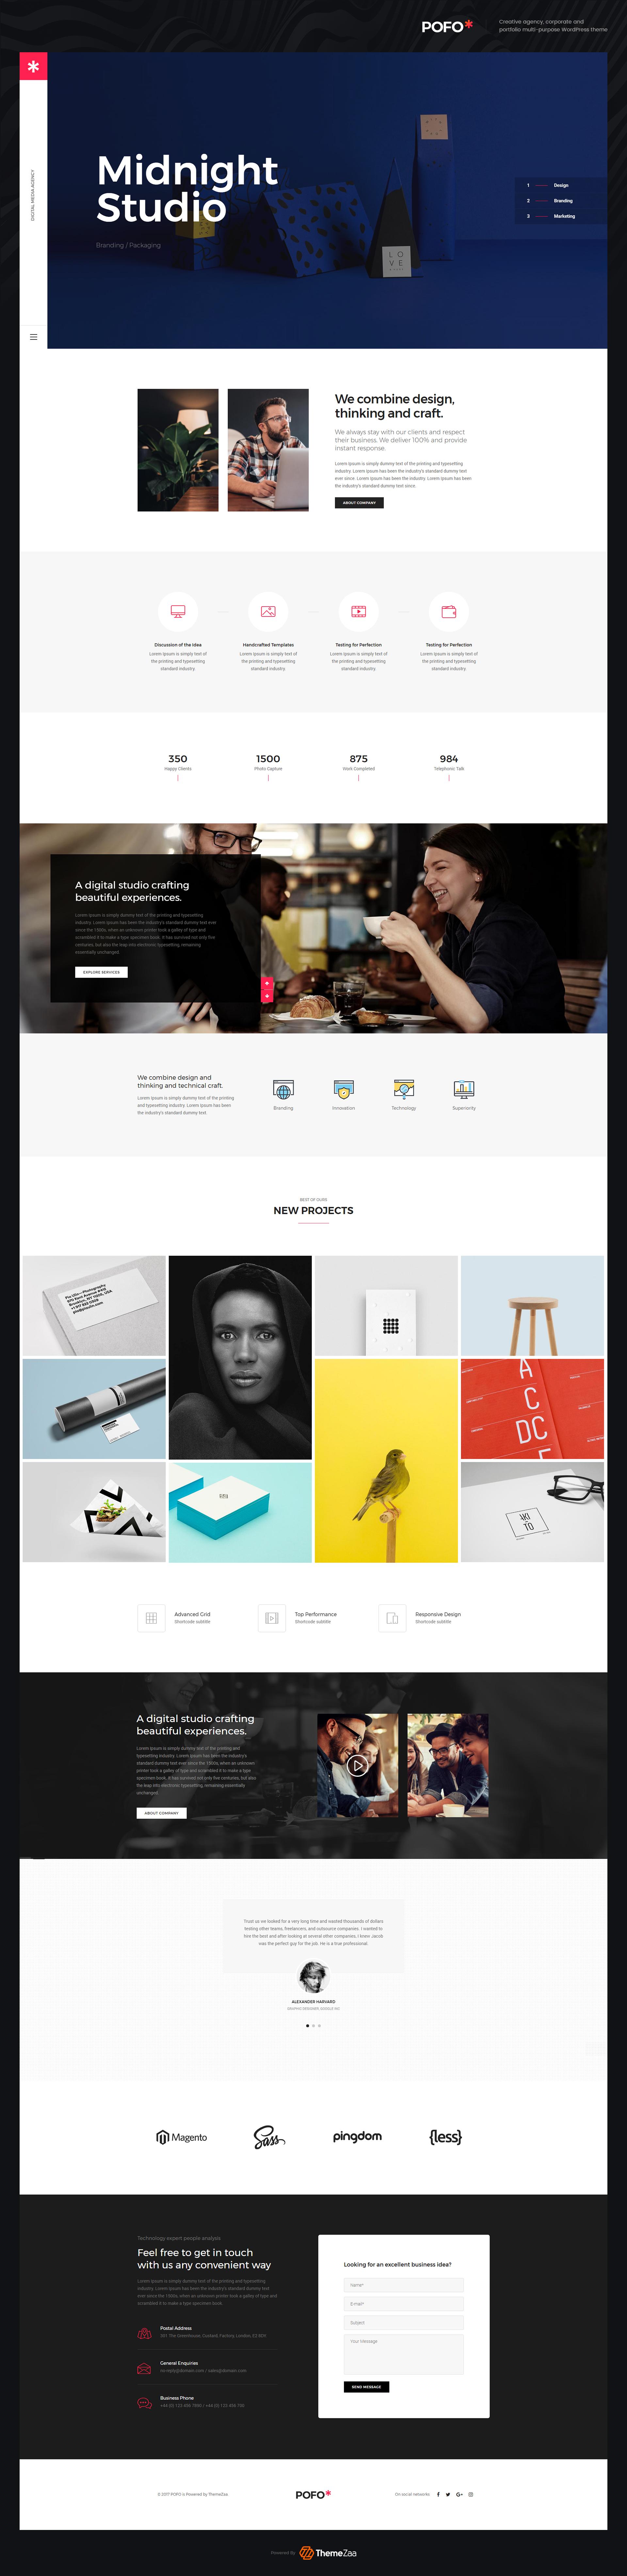 Pofo WordPress Theme - Creative Studio on Behance